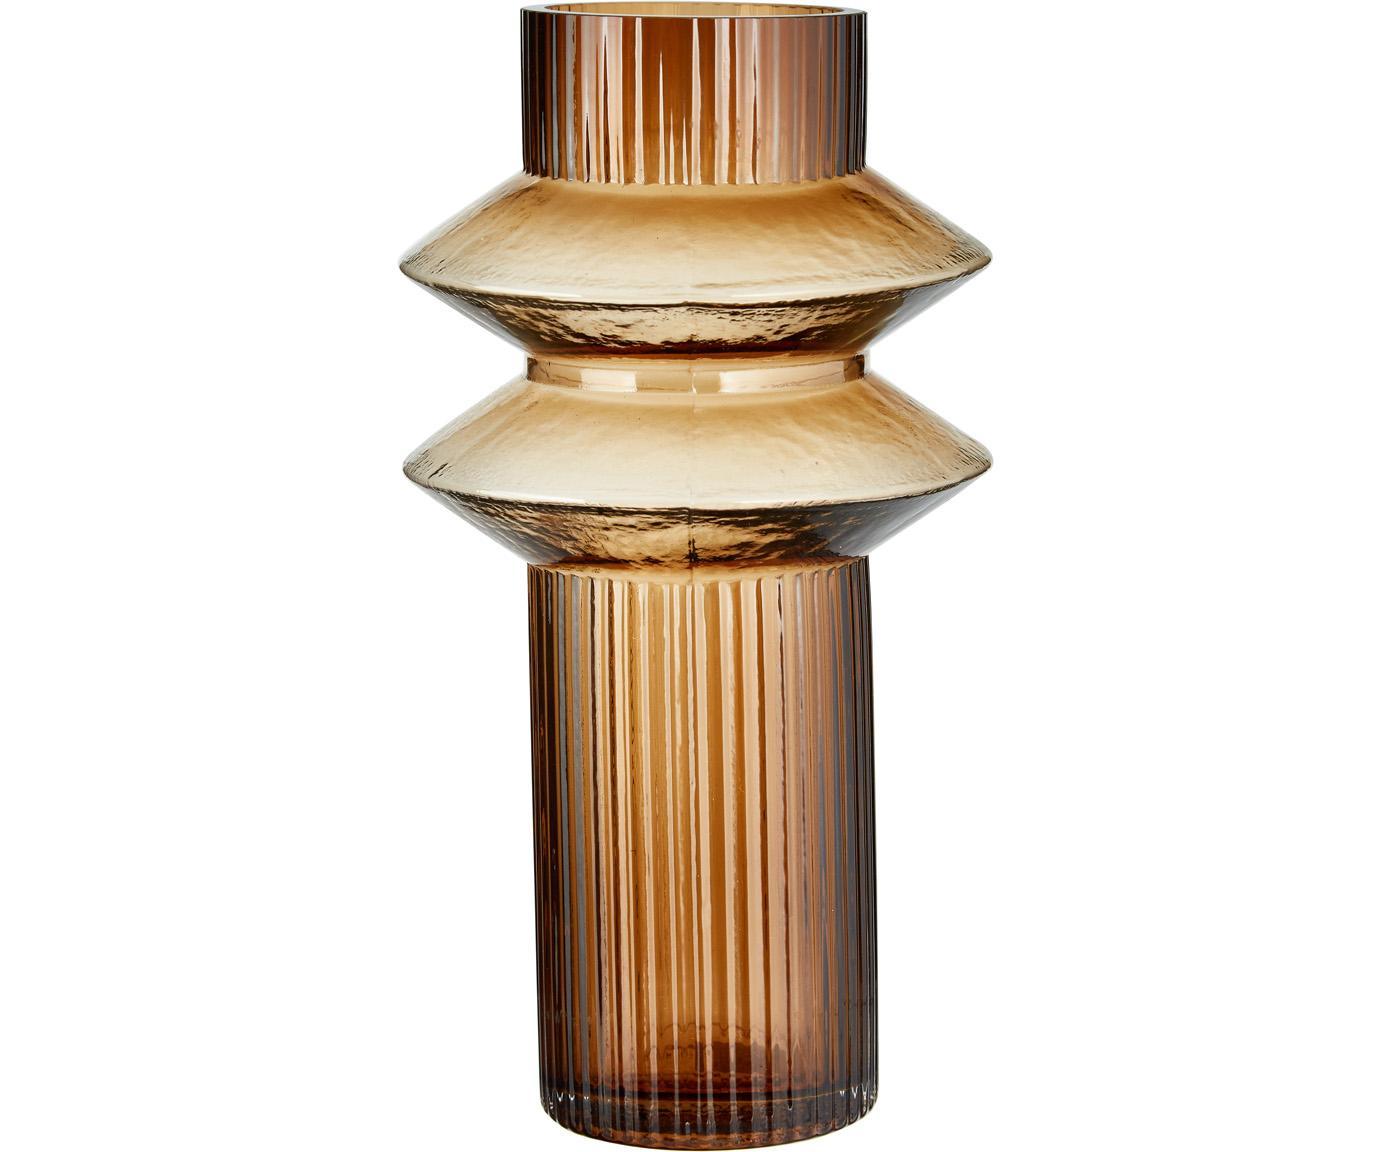 Vaas Rilla, Glas, Amberkleurig, Ø 9 x H 32 cm